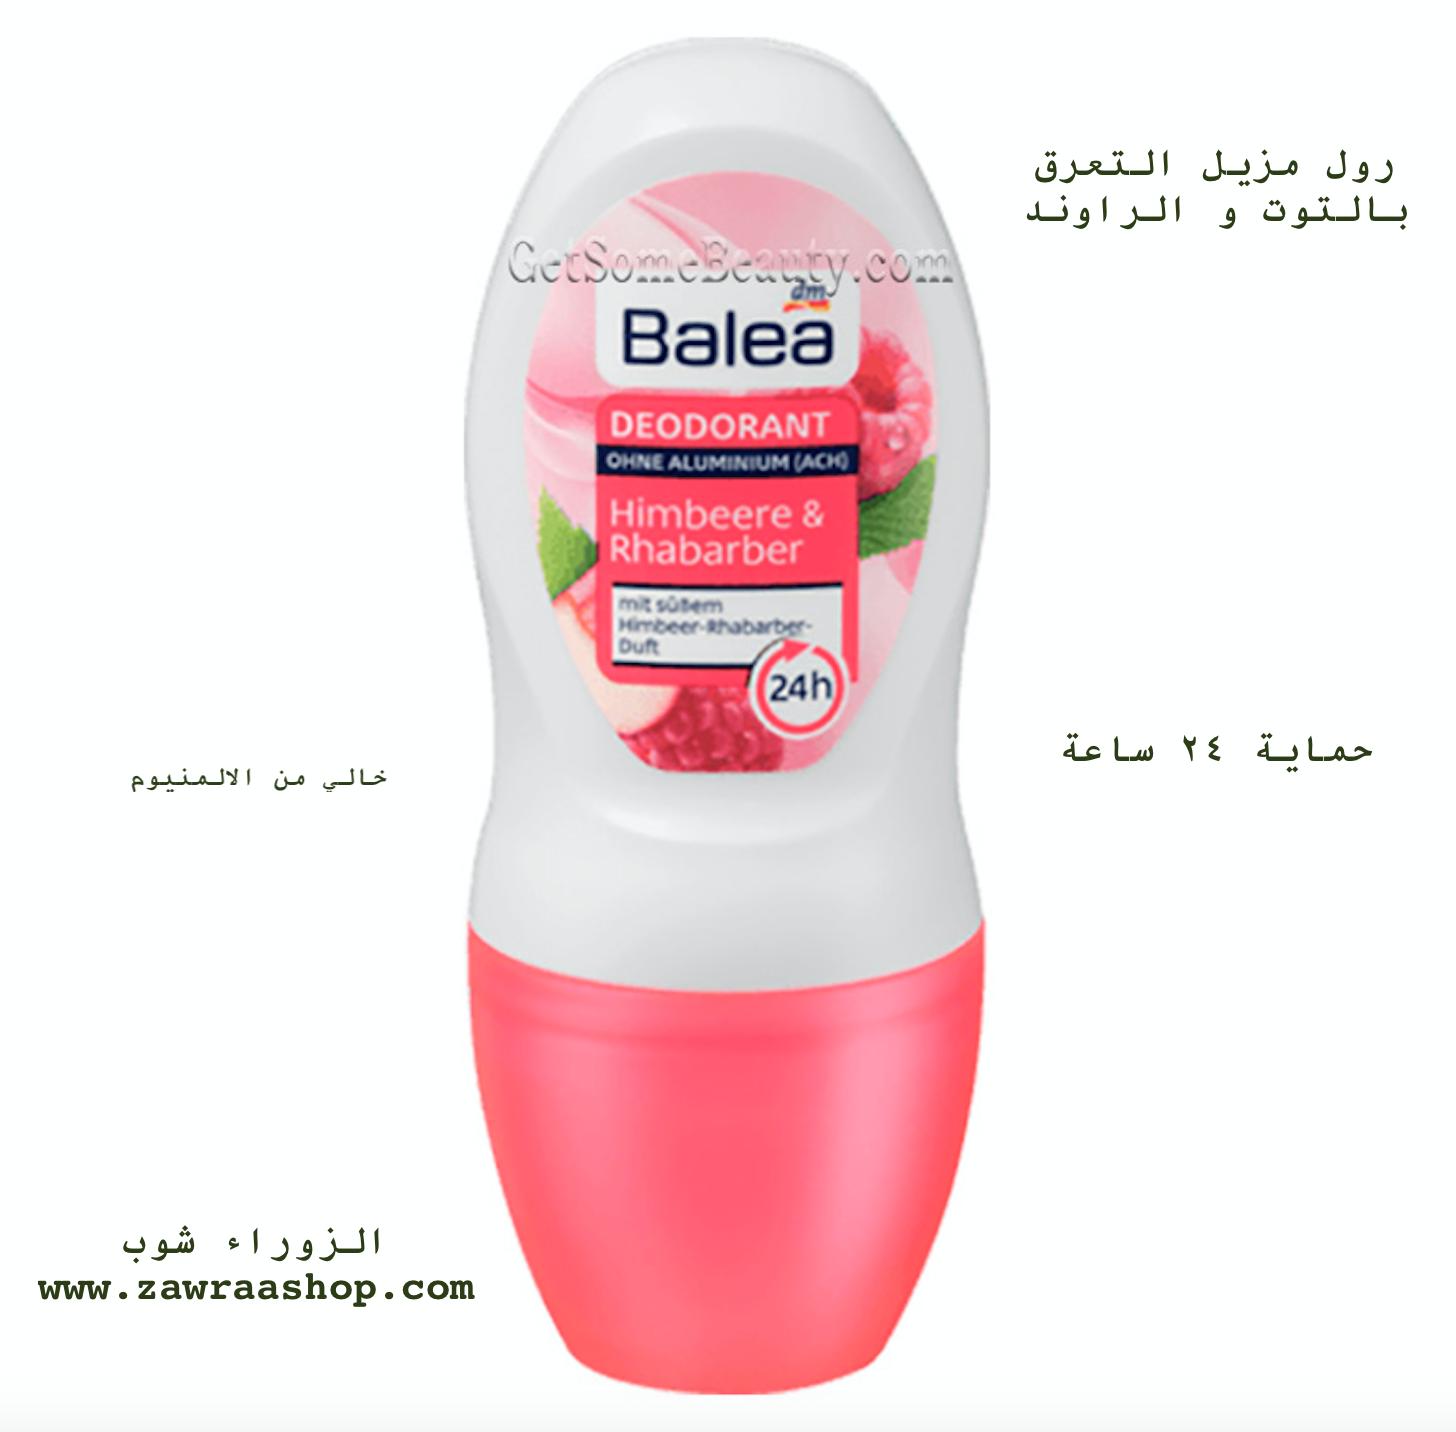 B109 deodorant himbeere & Rhabarber 50ml معطر رول 00435